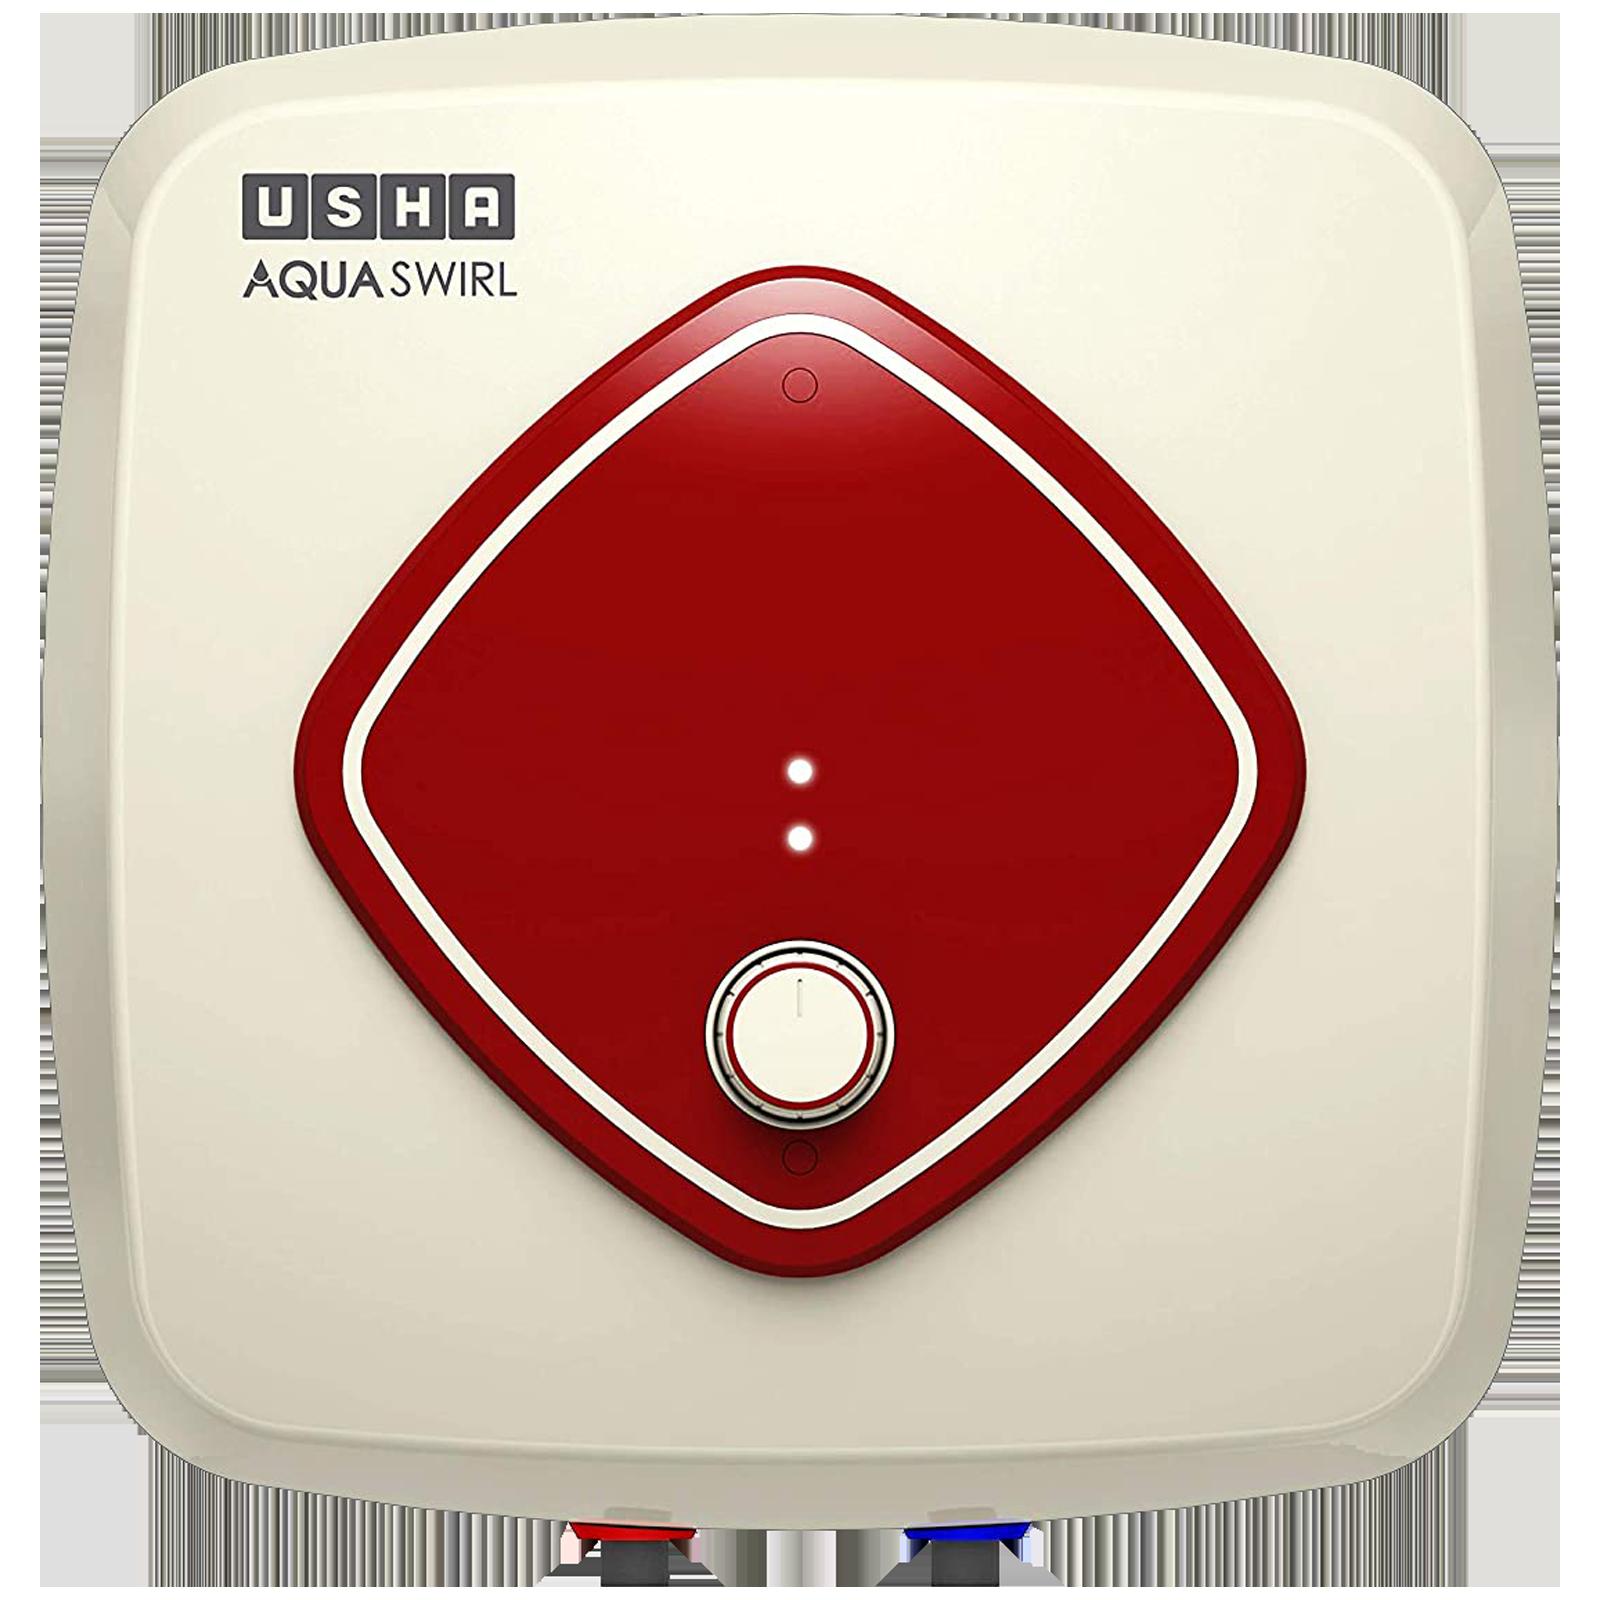 Usha Aqua Swirl 15 Litres 5 Star Storage Water Geyser (2000 Watts, 4687AS15AX159N, Ivory Wine)_1